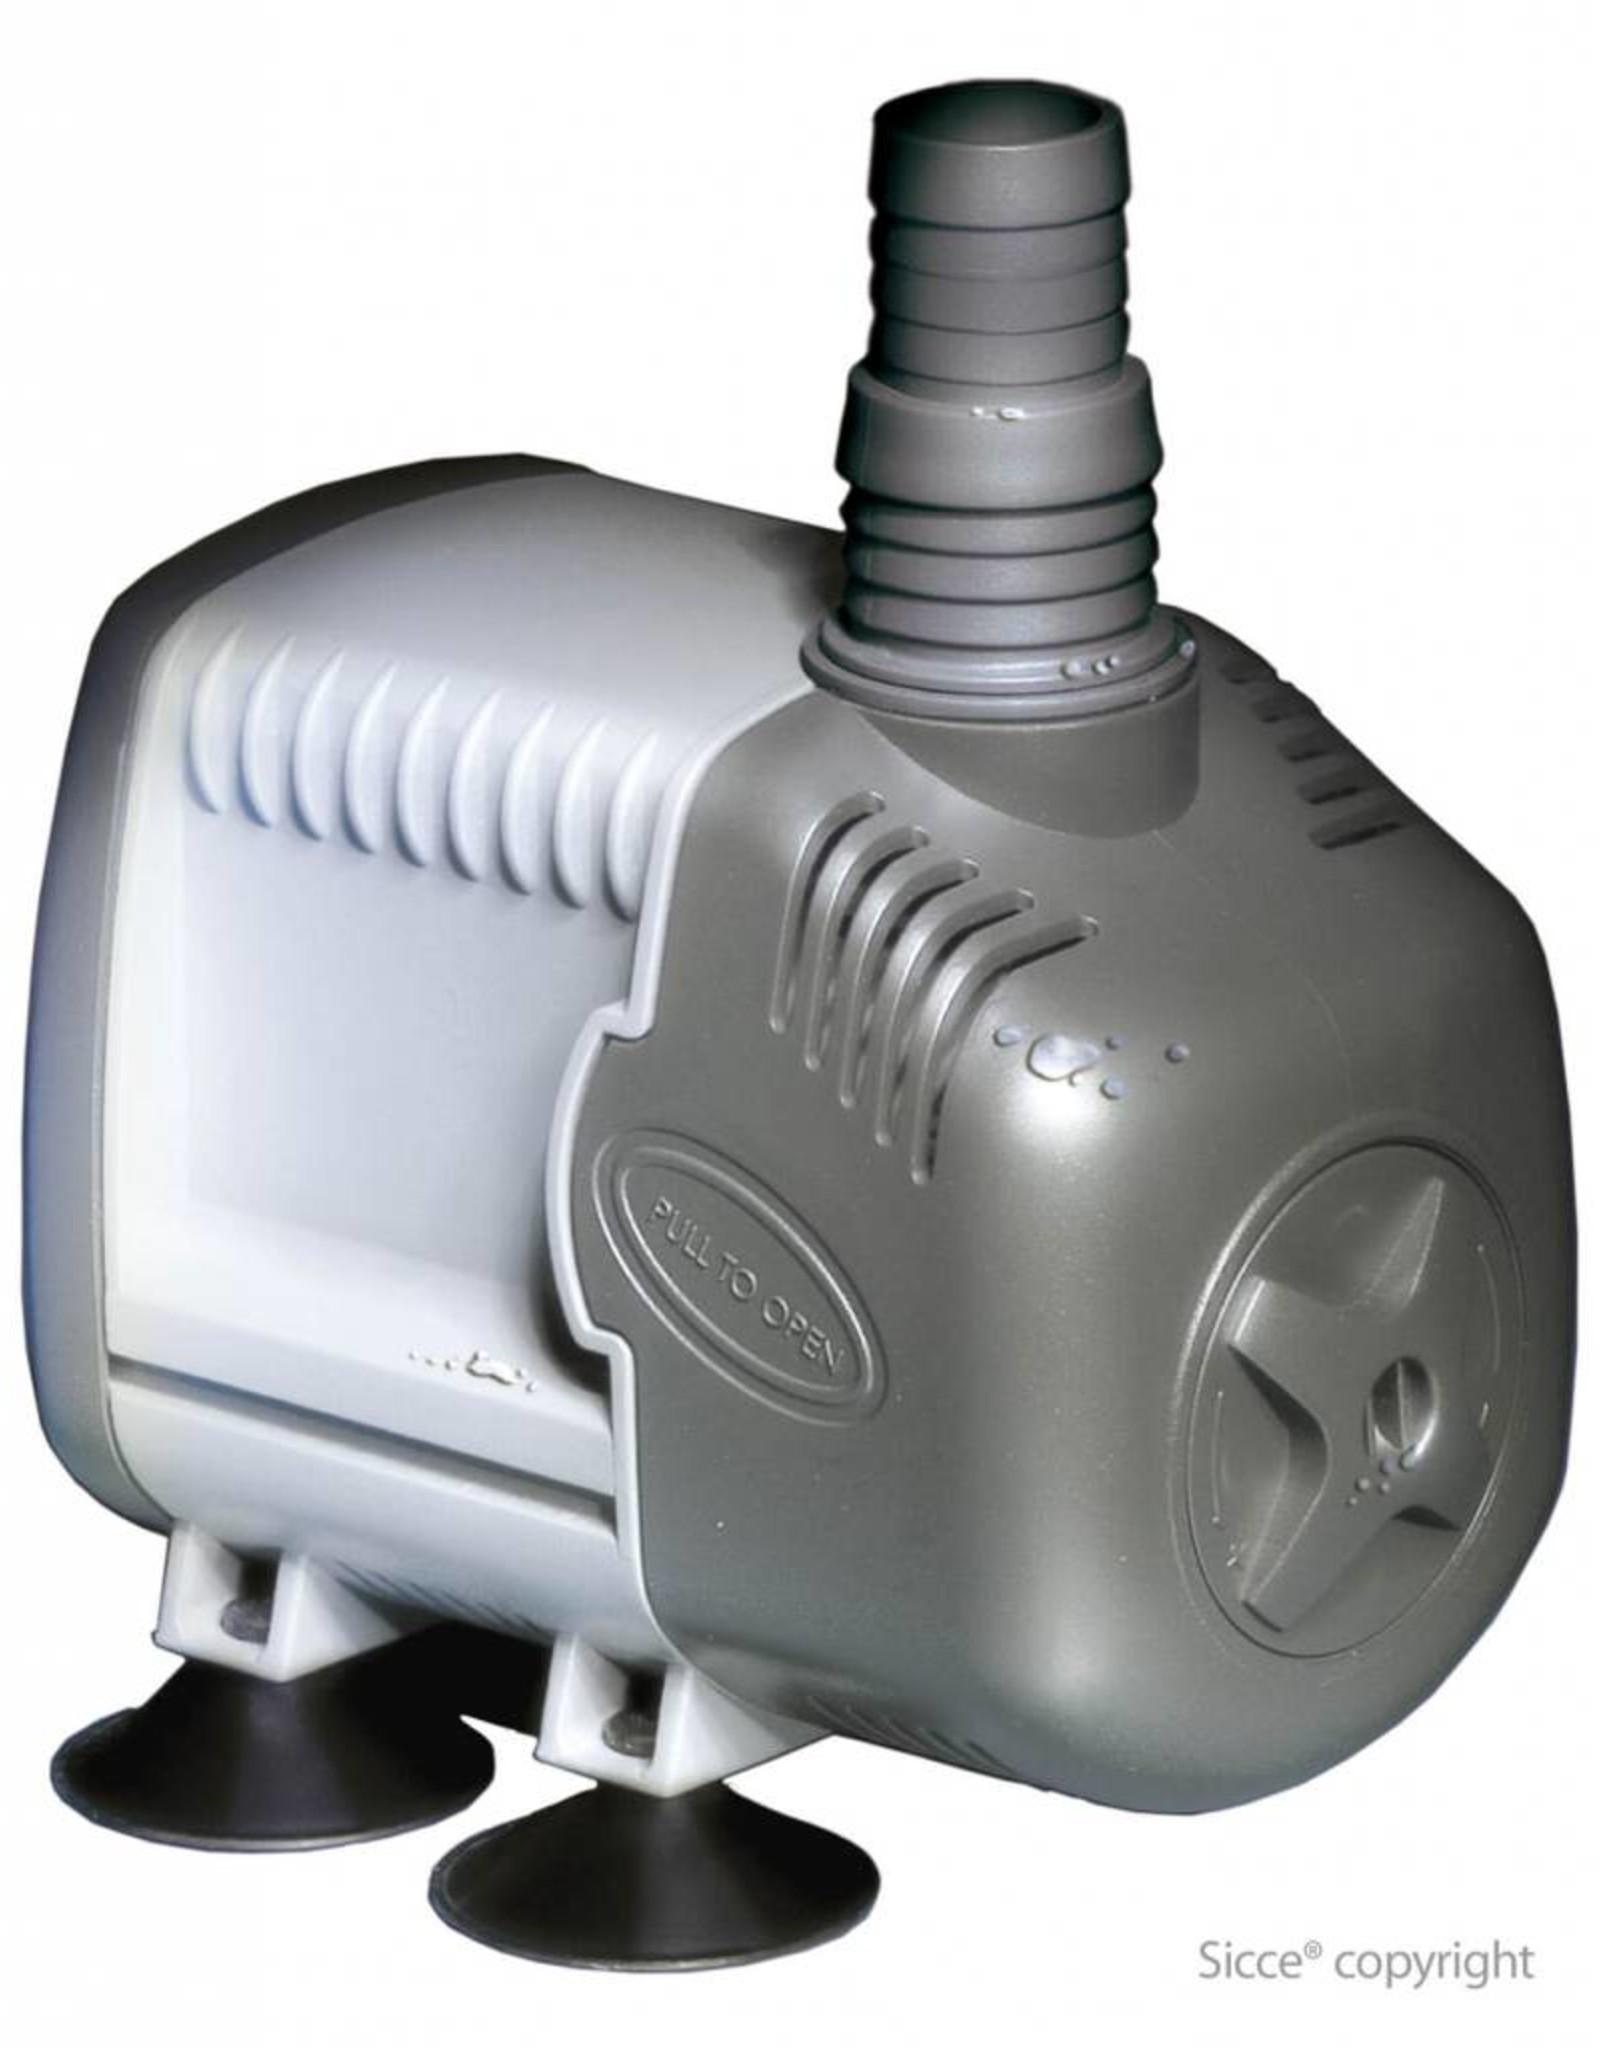 SICCE Syncra 3.0 Aquarium Pump 714gph